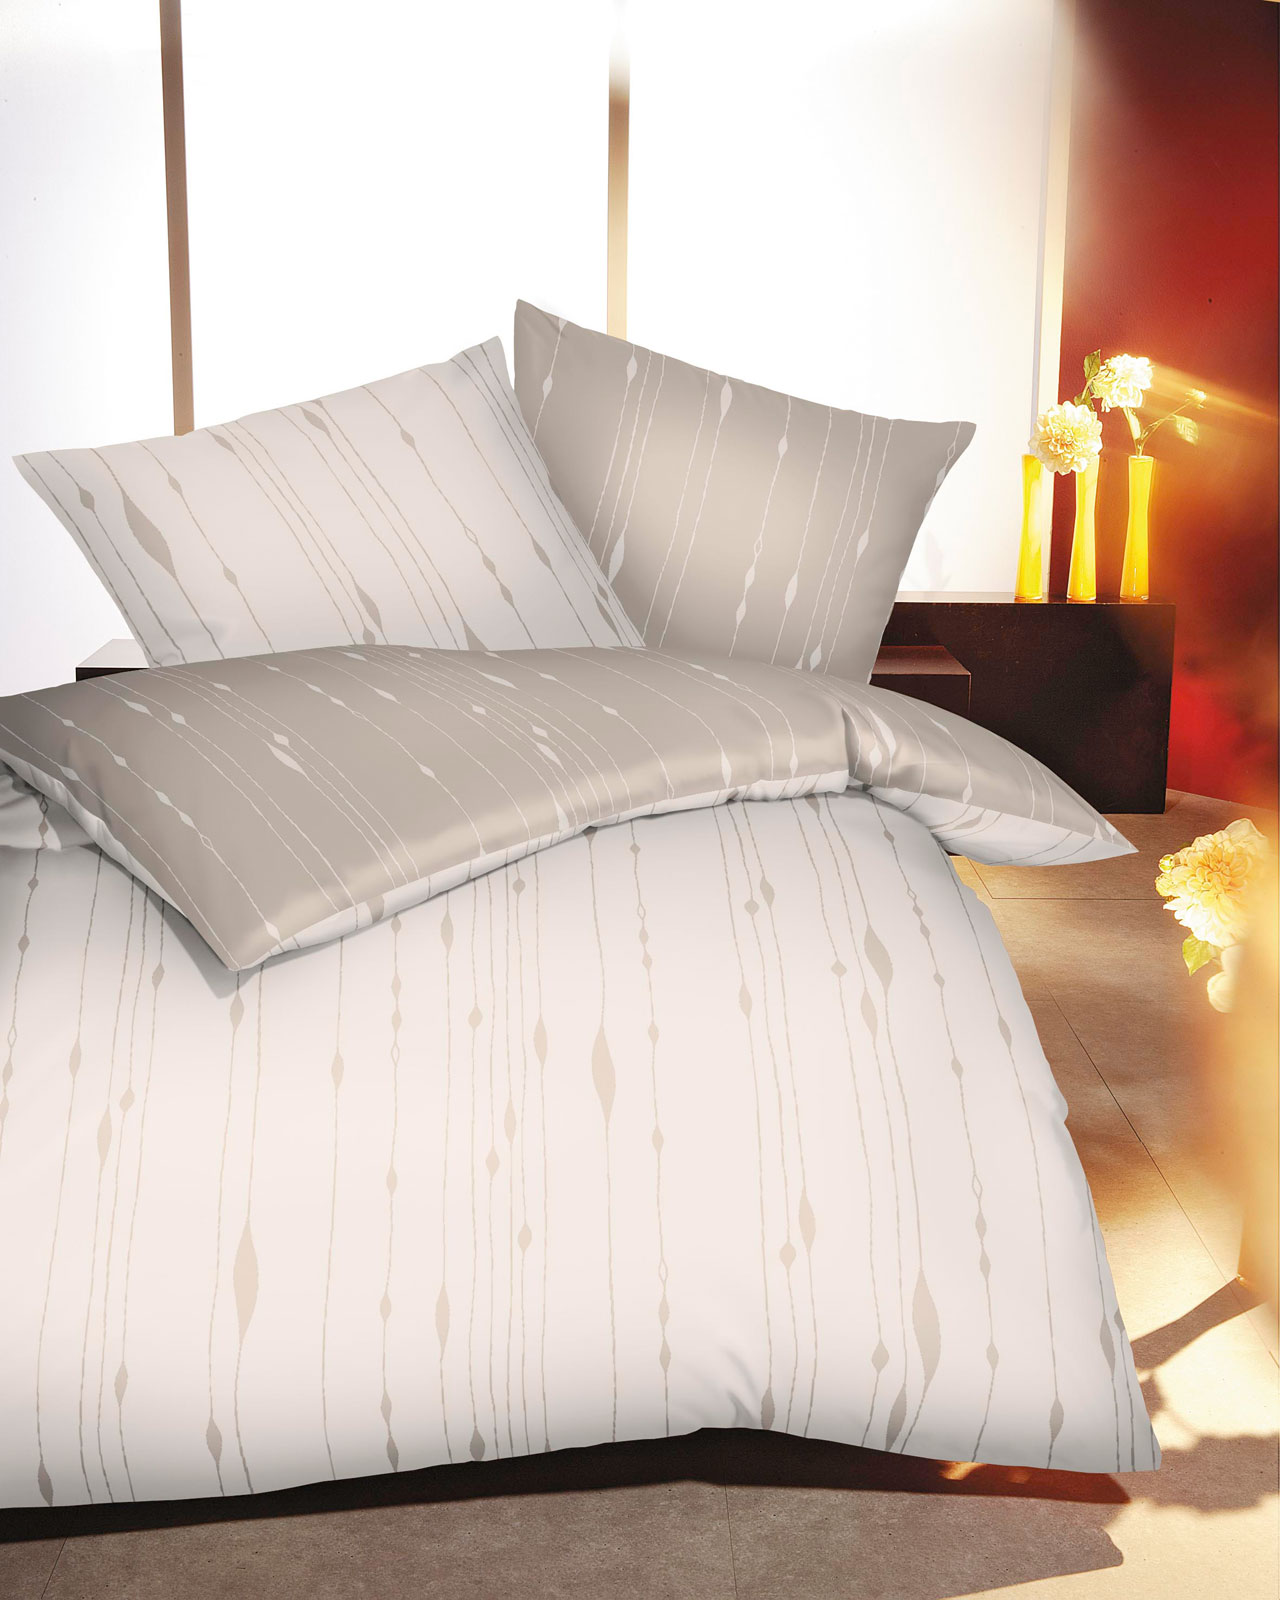 kaeppel biber feinbiber bettw sche 100 baumwolle cocoon. Black Bedroom Furniture Sets. Home Design Ideas